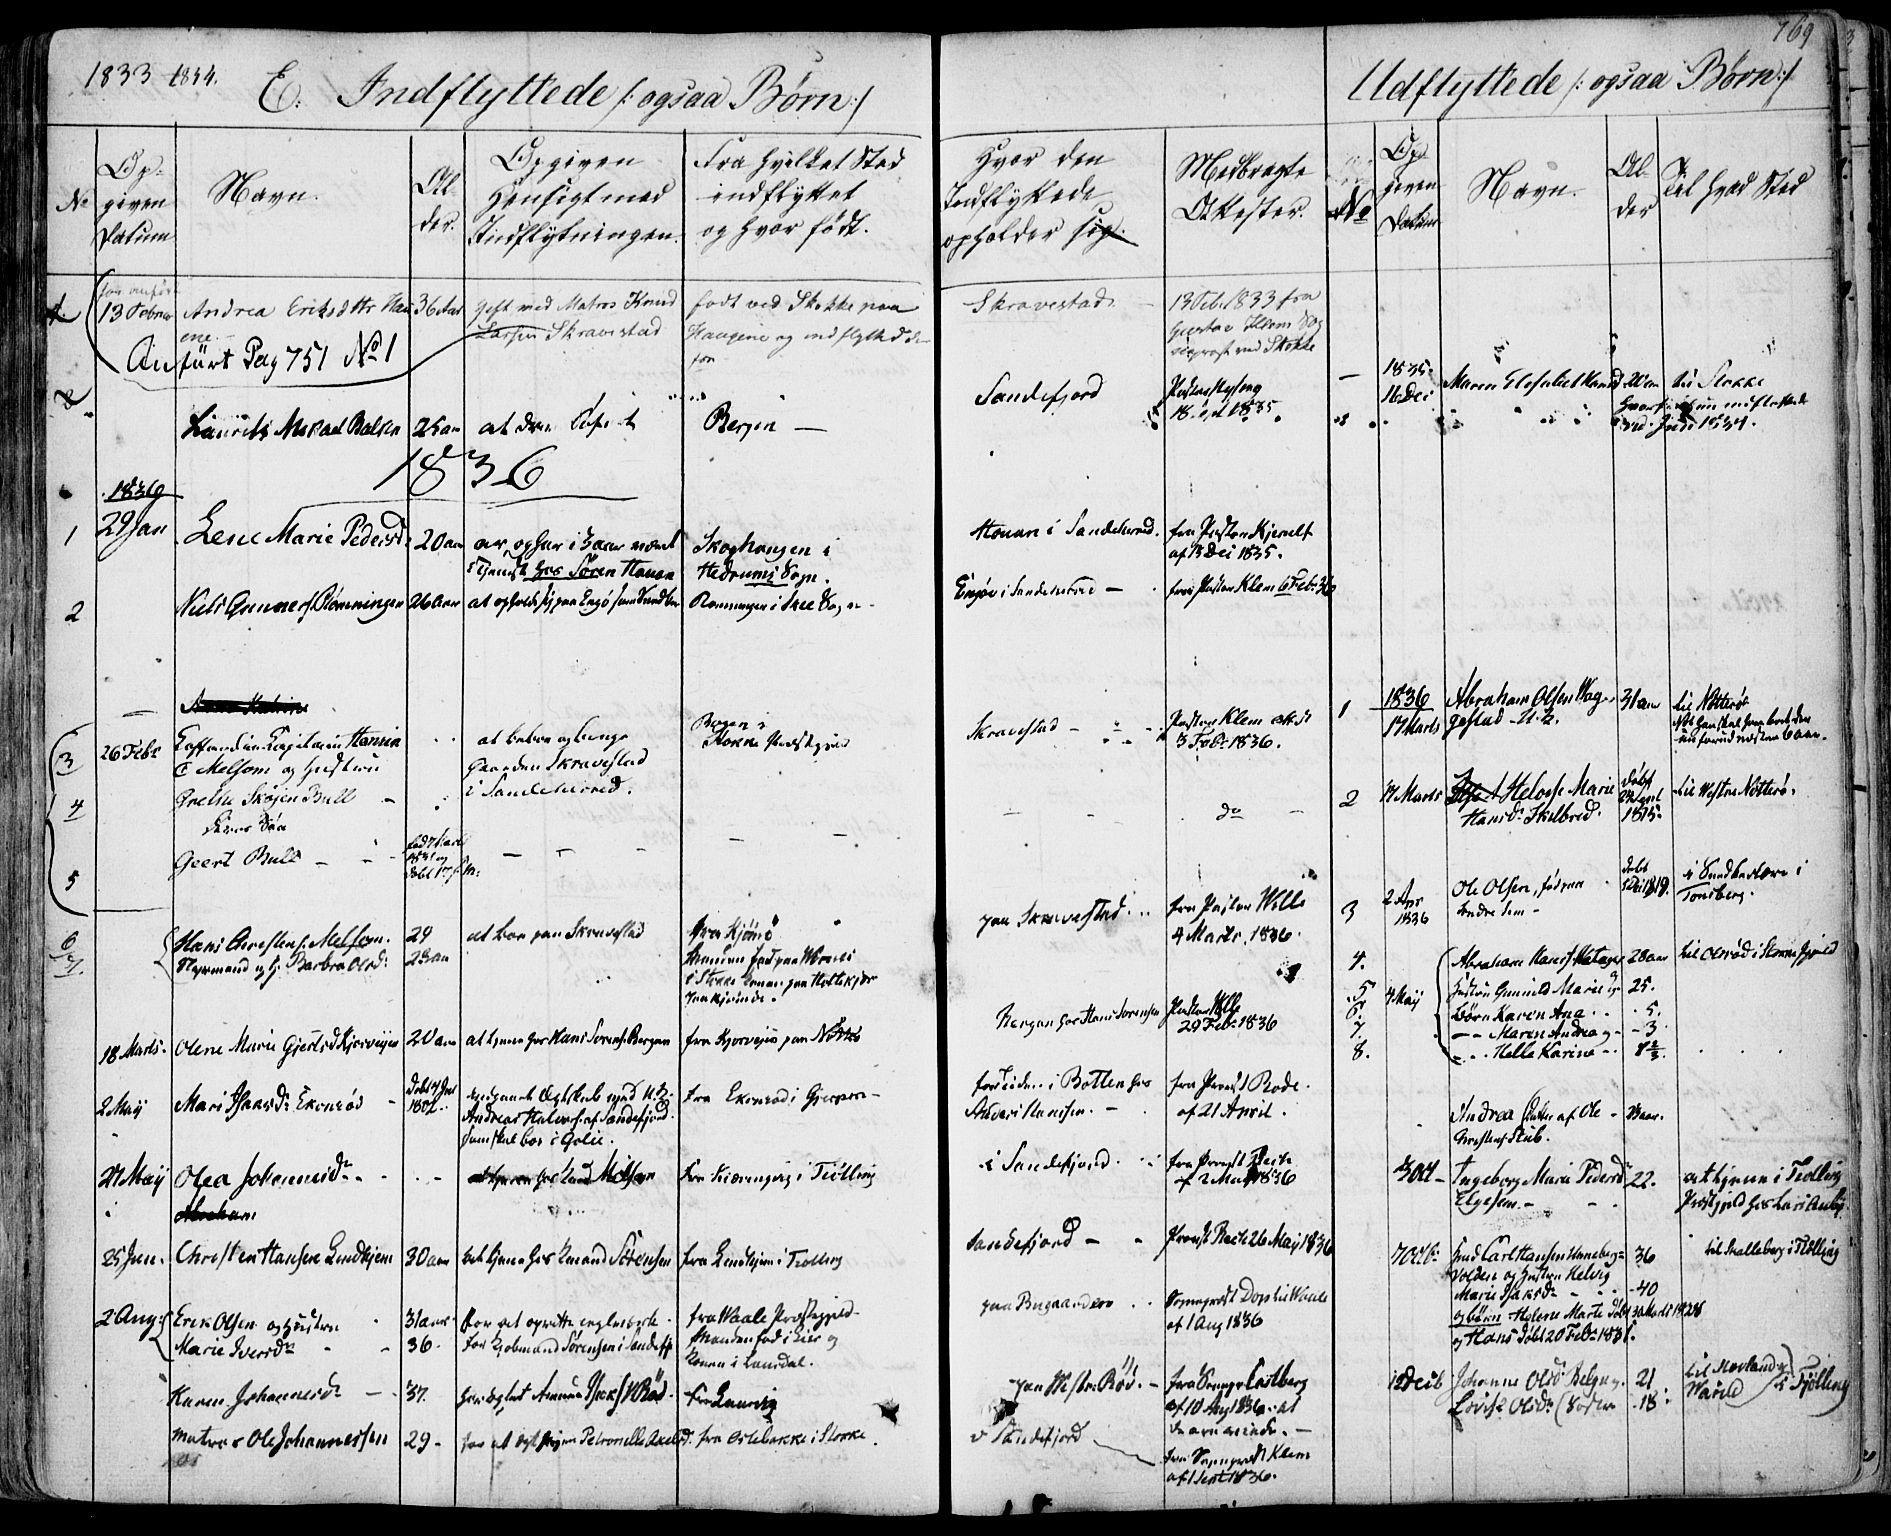 SAKO, Sandar kirkebøker, F/Fa/L0005: Parish register (official) no. 5, 1832-1847, p. 768-769